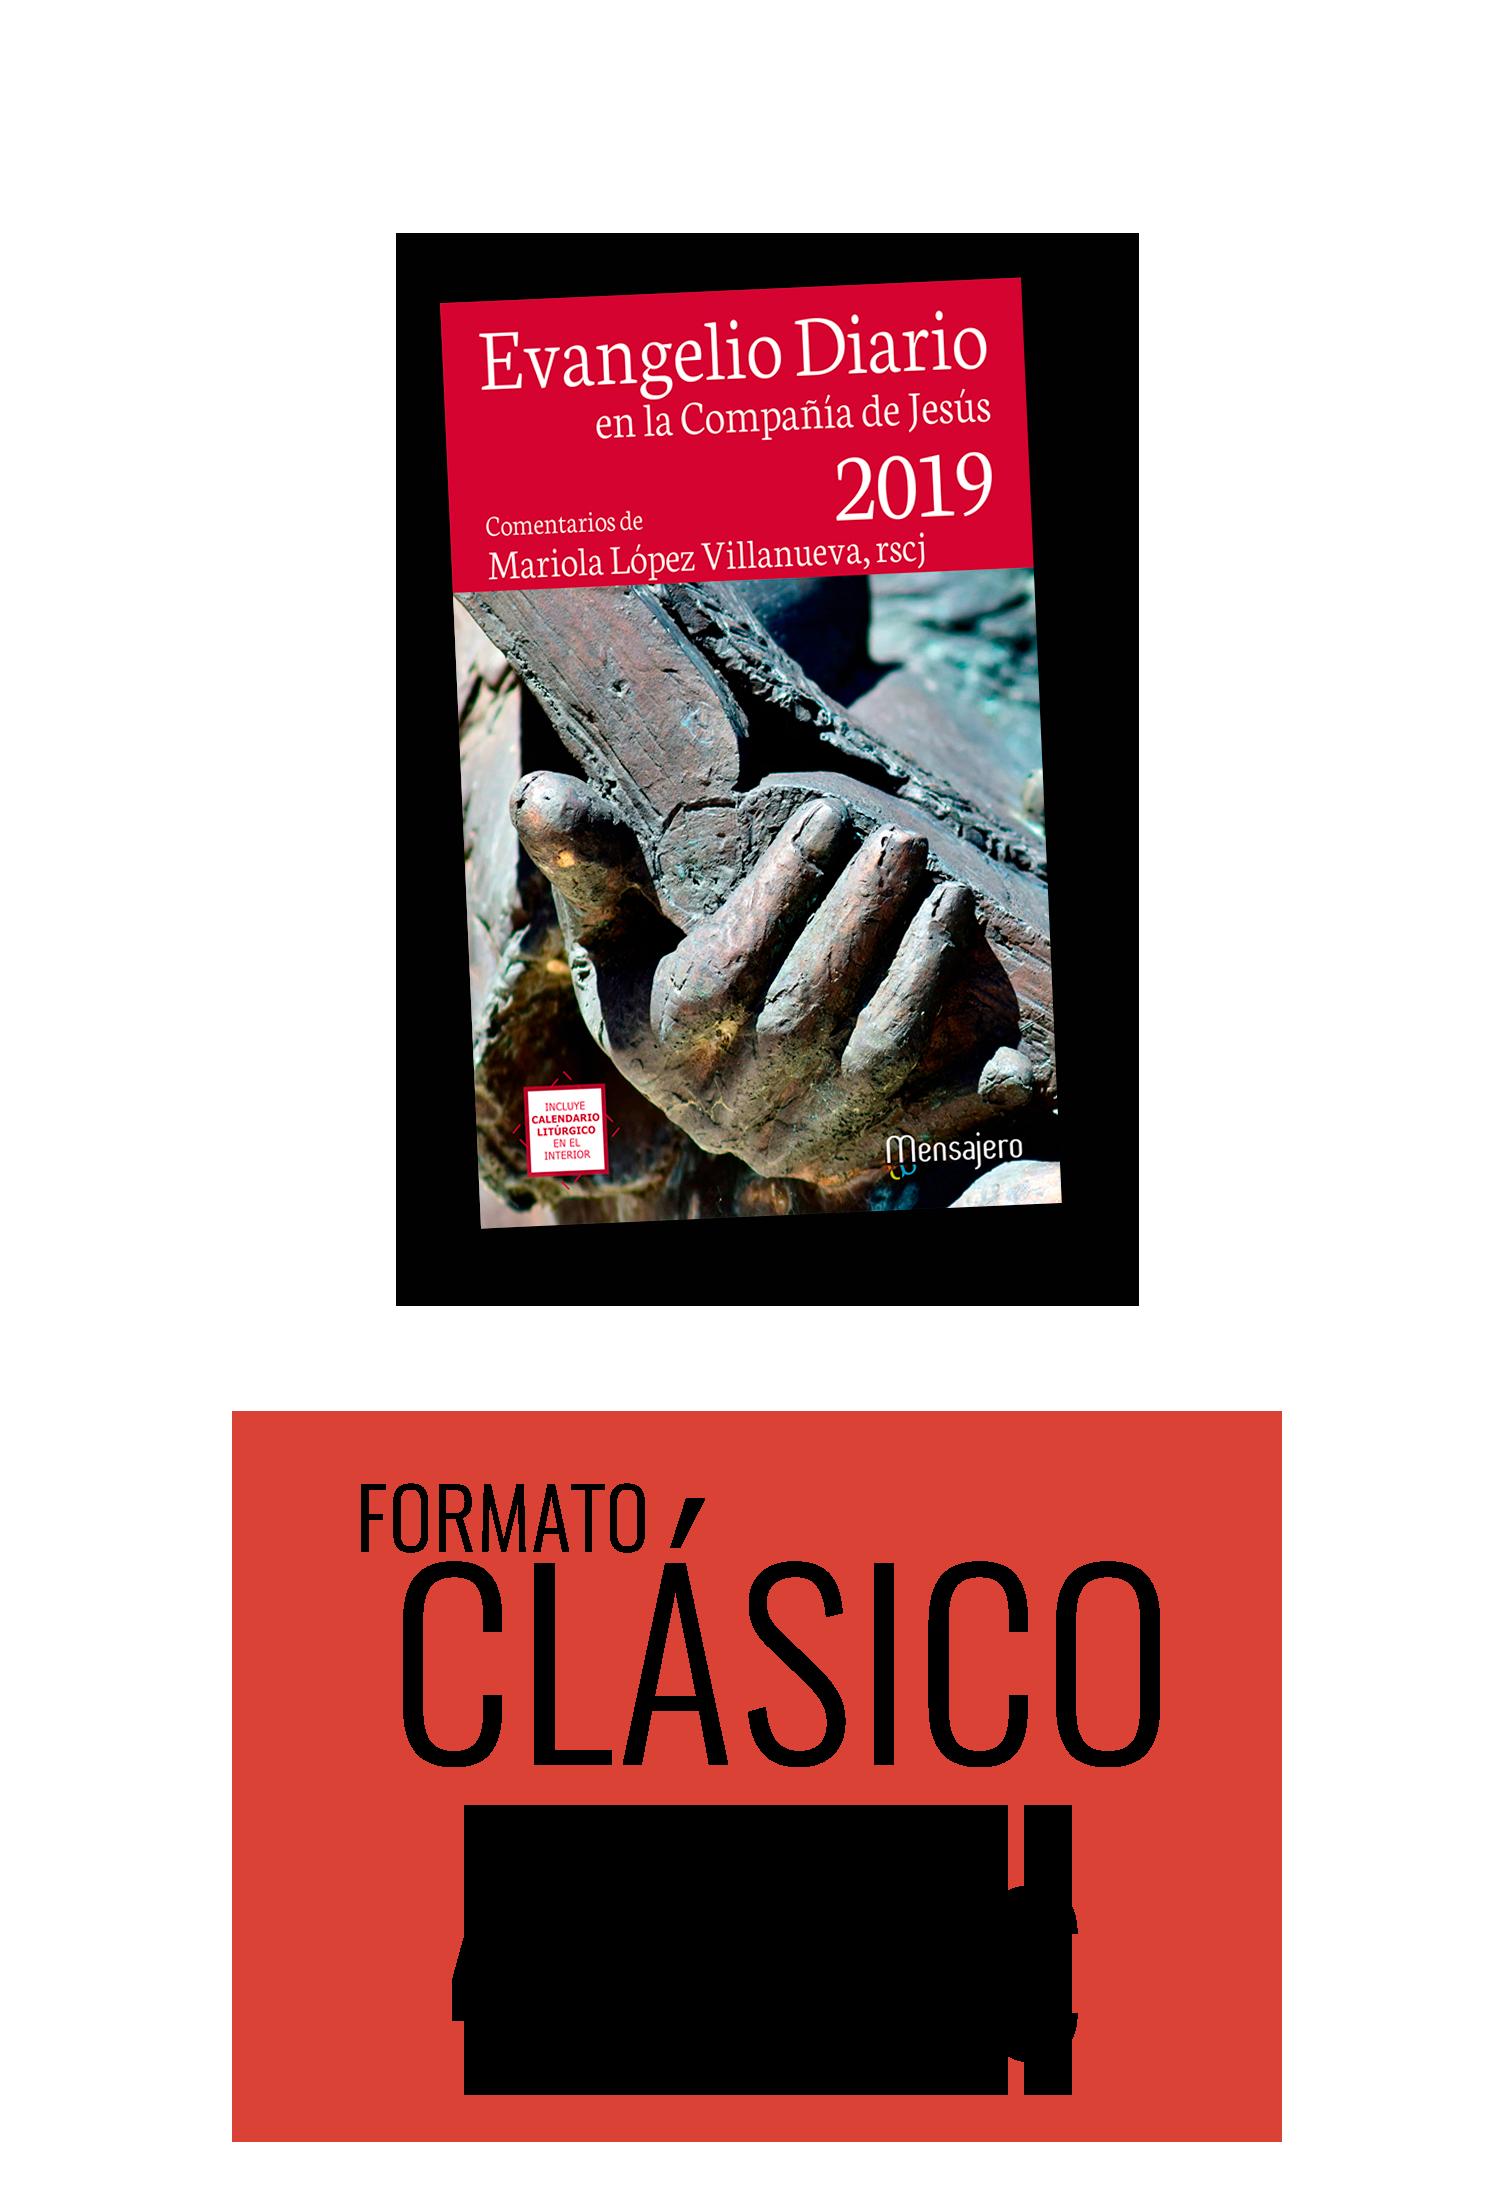 20180803-evangelio-clásico-landing-page-evangelio-diario